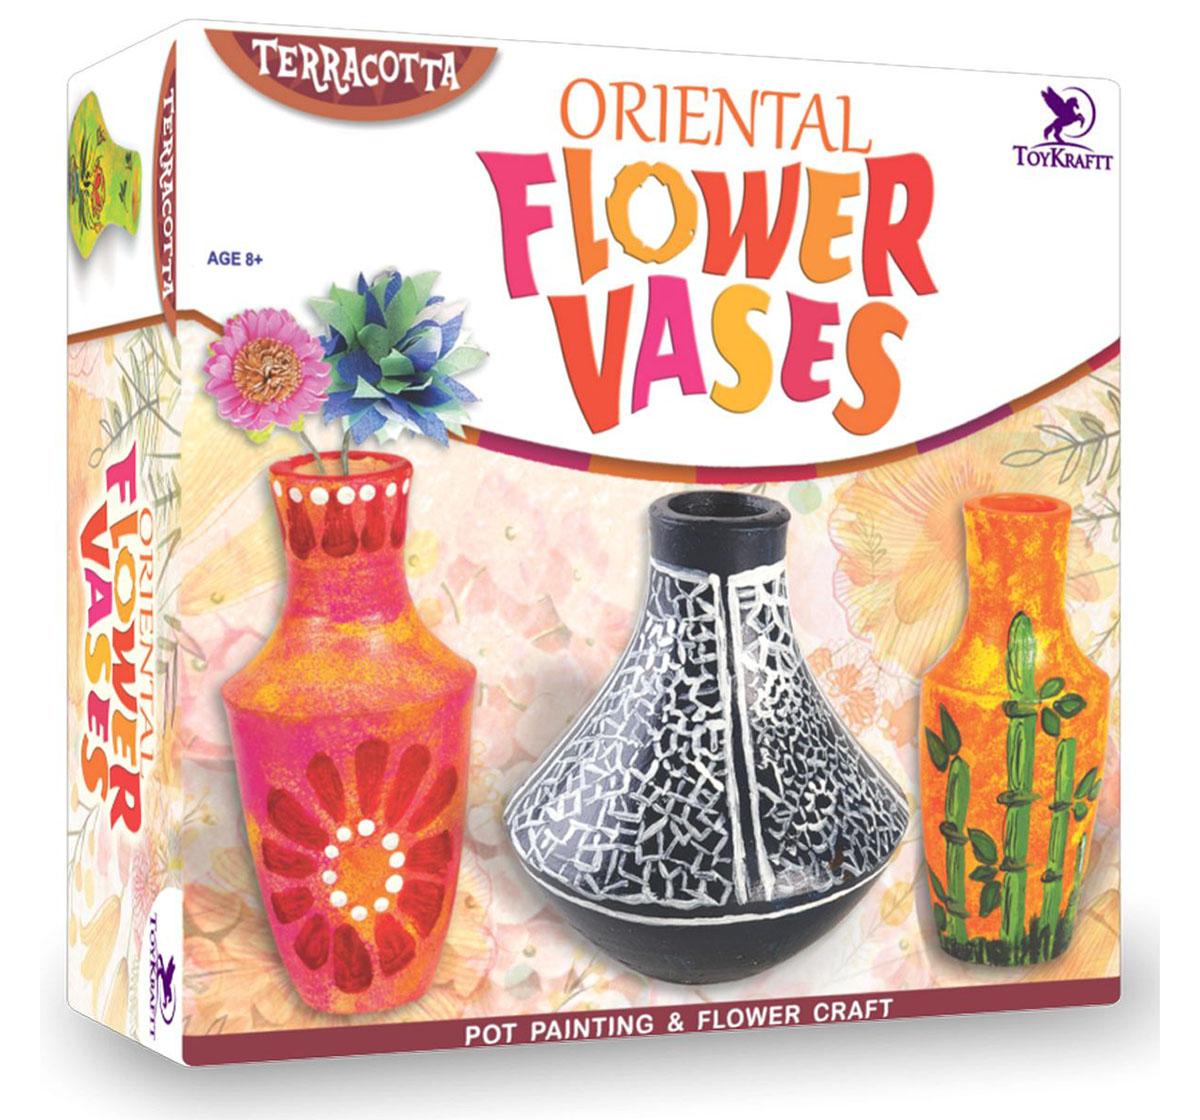 Toy Kraft | Toy Kraft Oriental Flower Vases DIY Art & Craft Kits for Kids age 8Y+